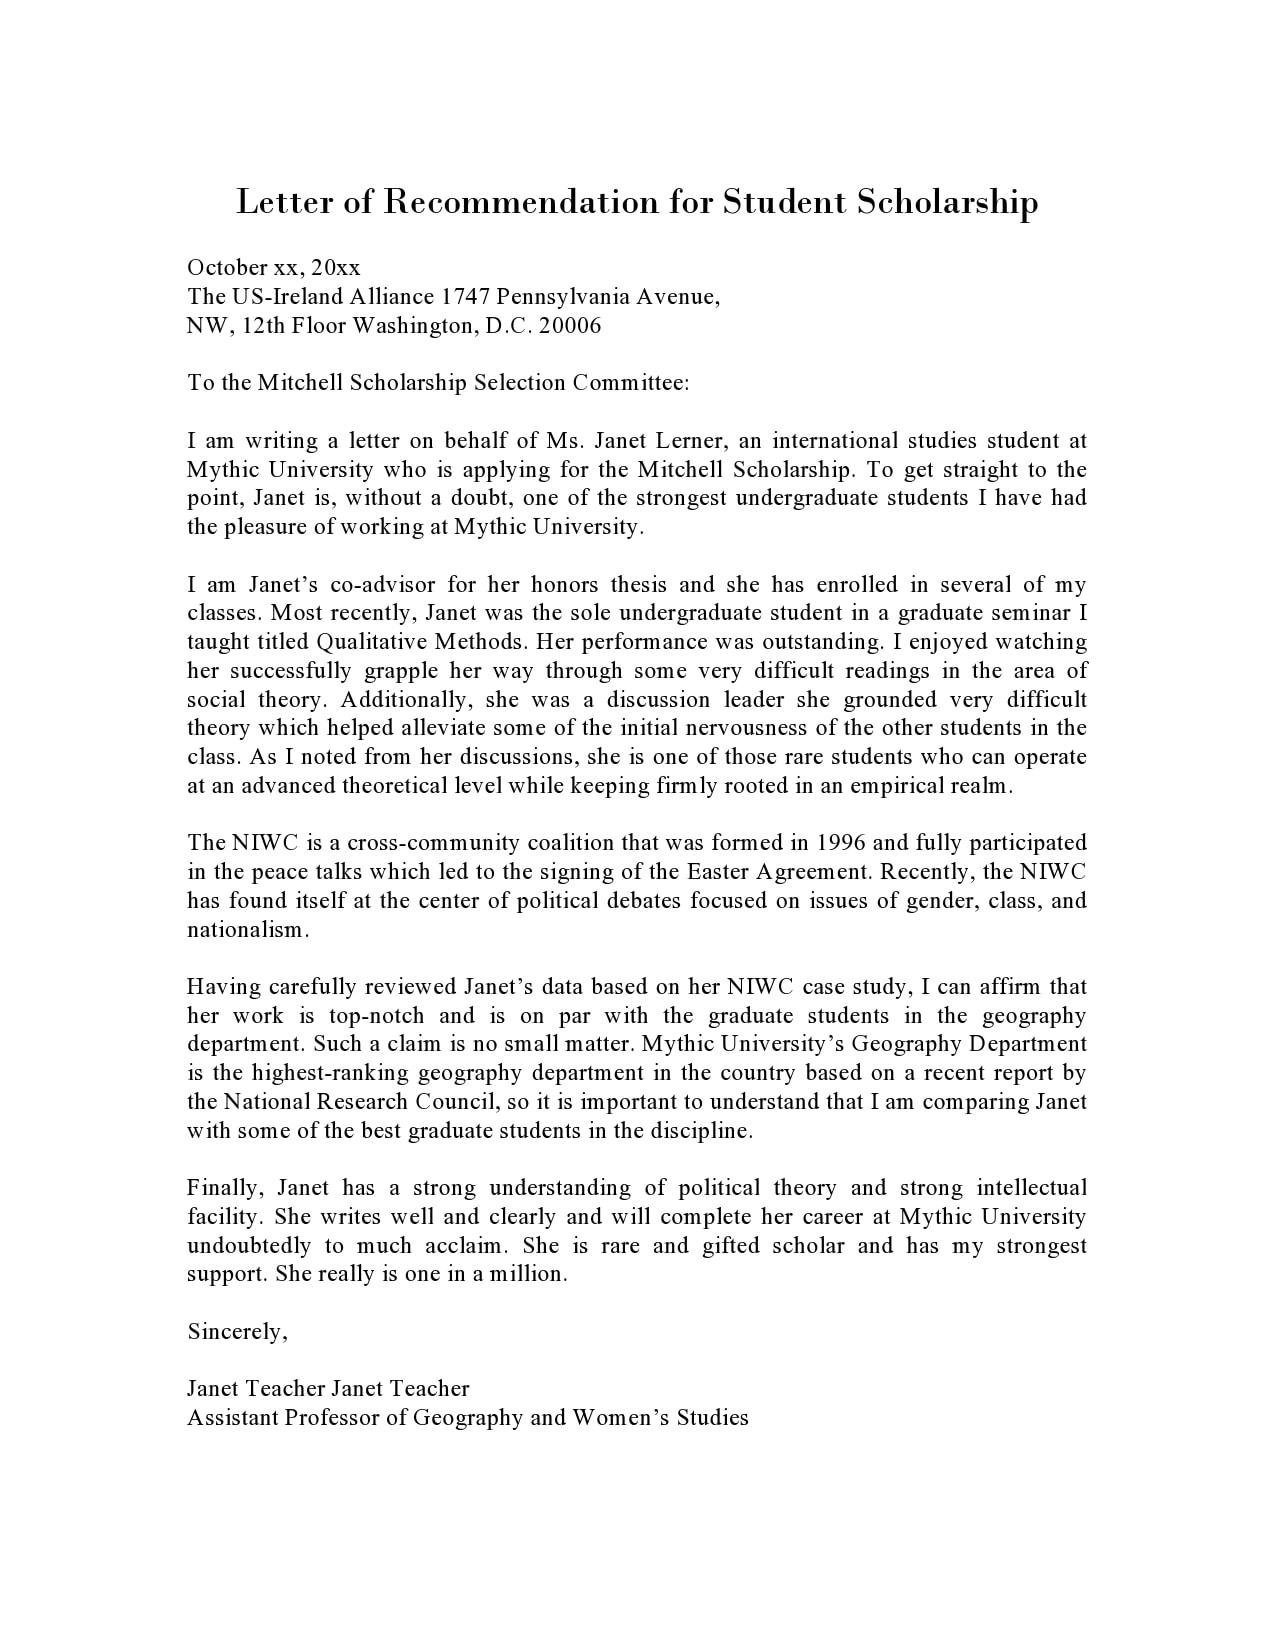 recommendation letter for scholarship 01